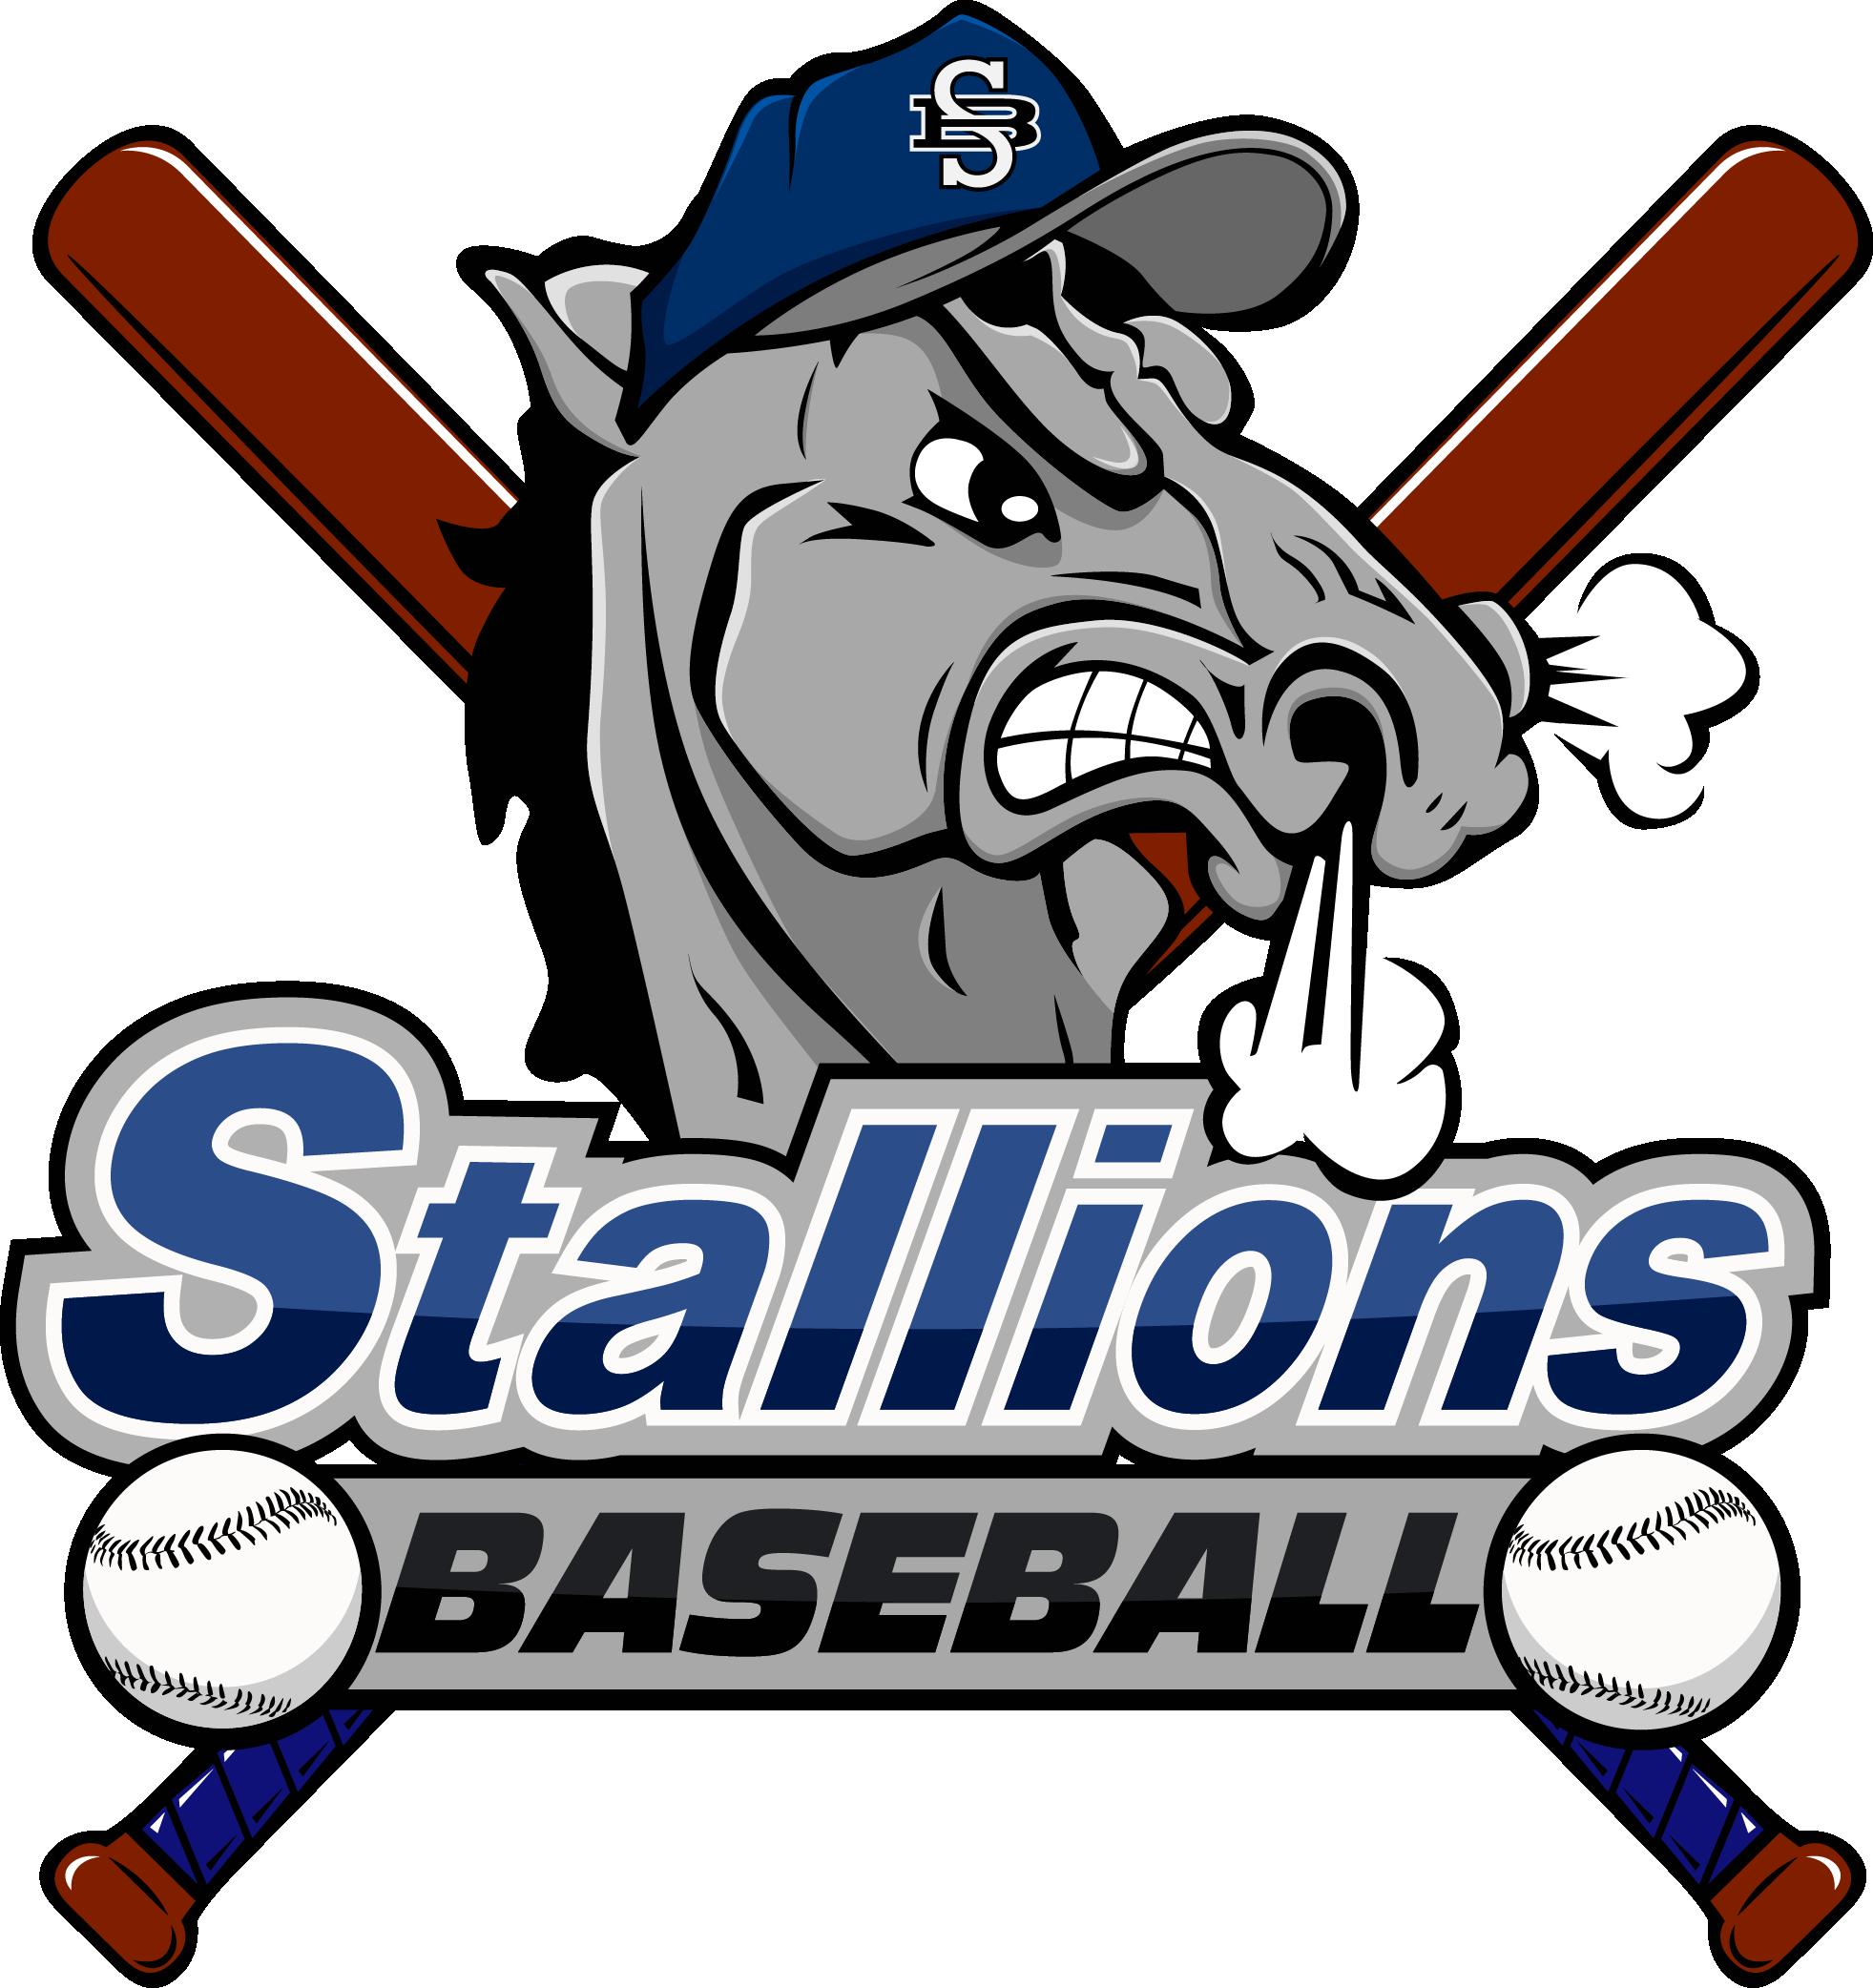 Volunteering clipart baseball. Stallions club